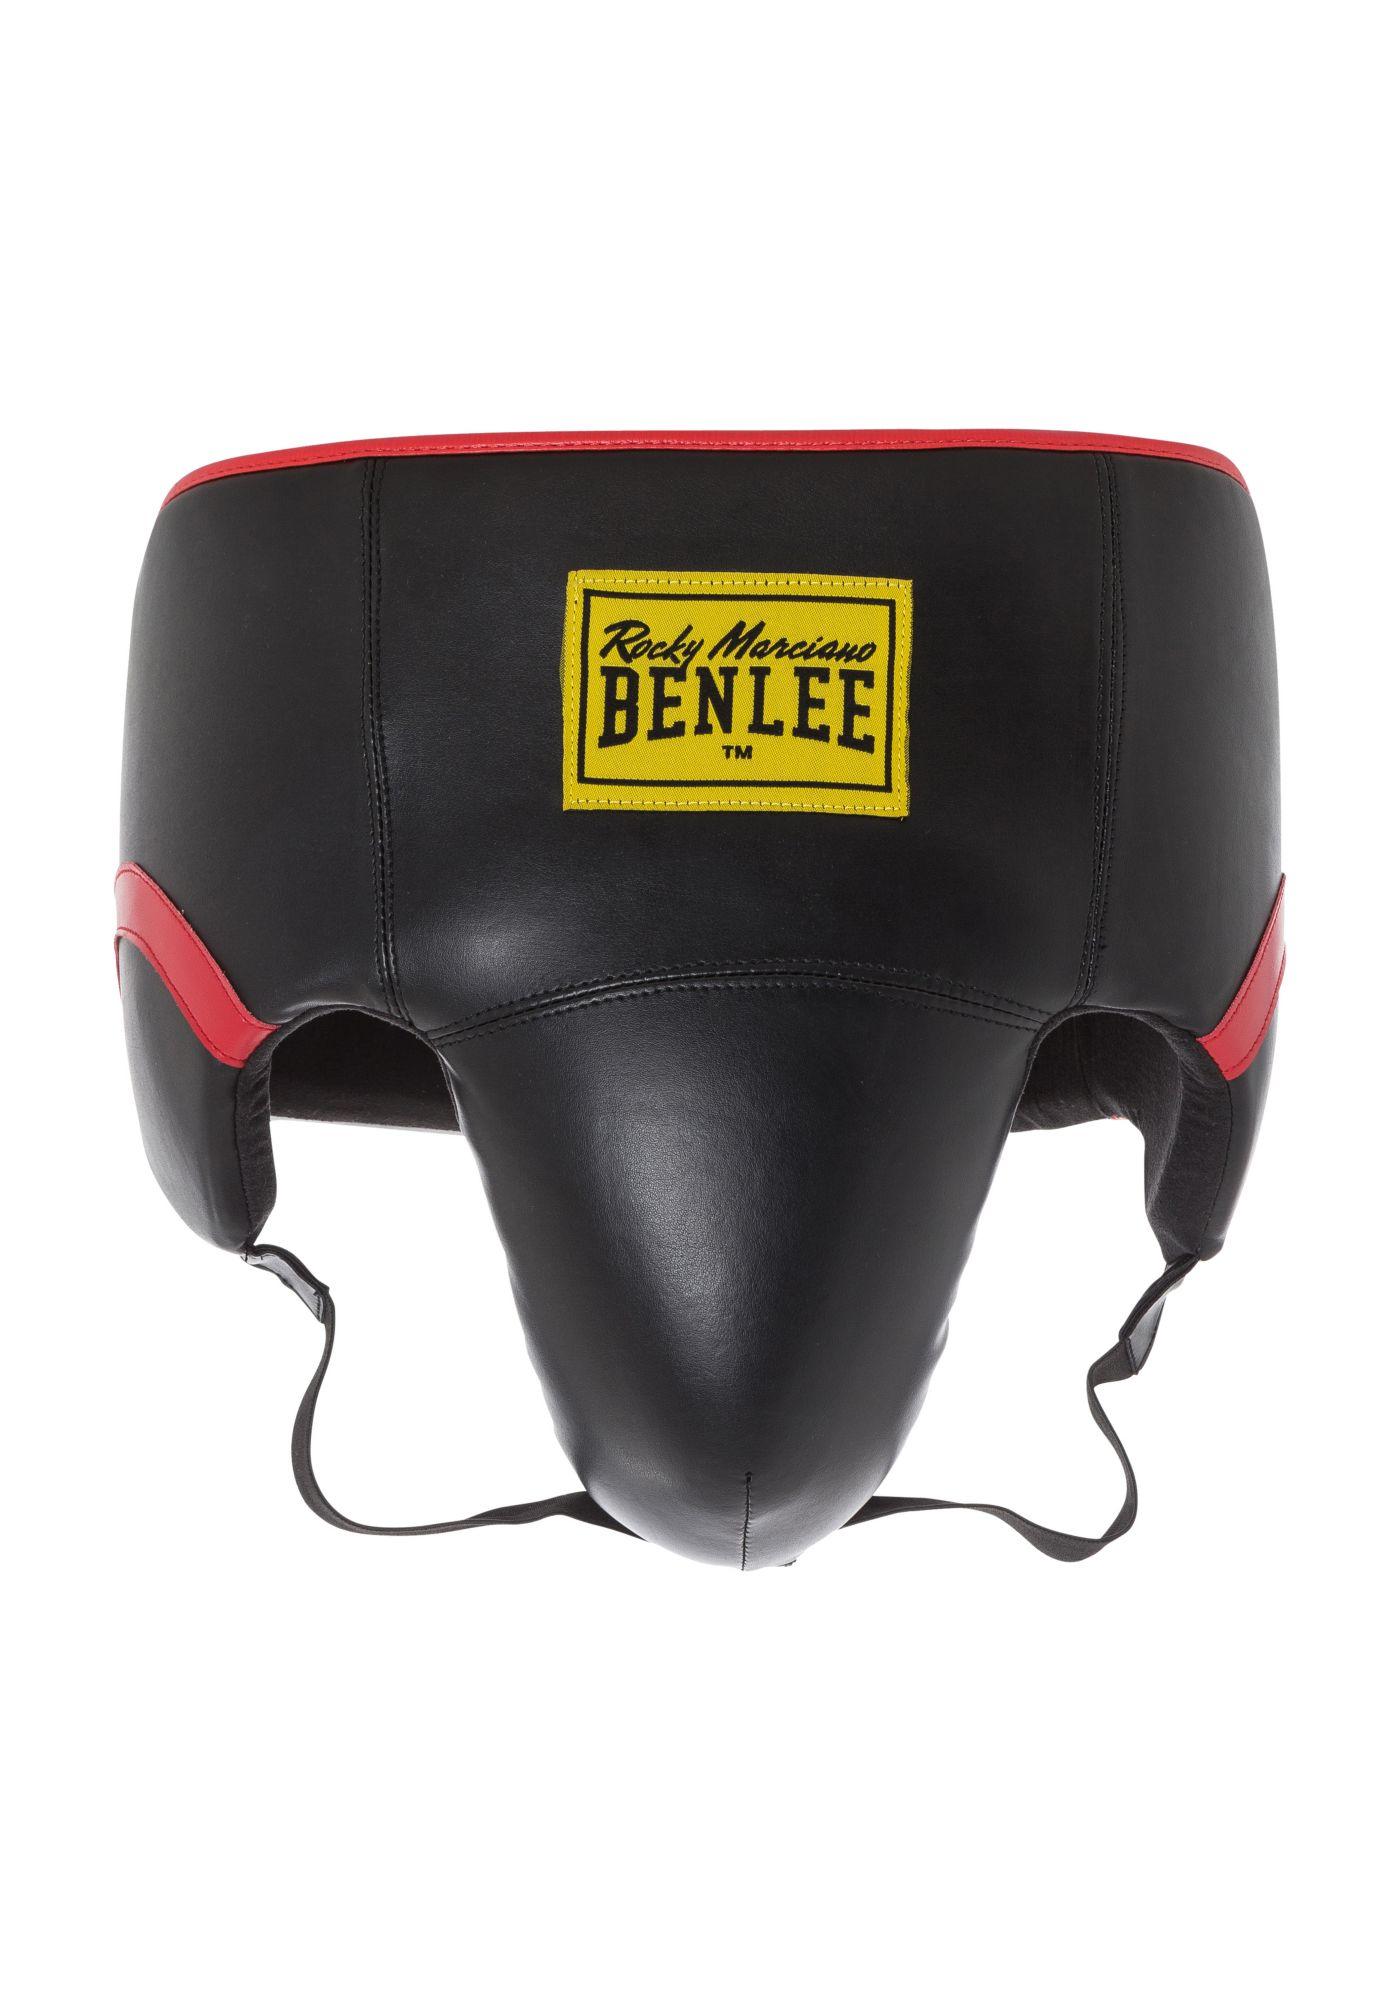 BENLEE ROCKY MARCIANO Benlee Rocky Marciano Accessoires